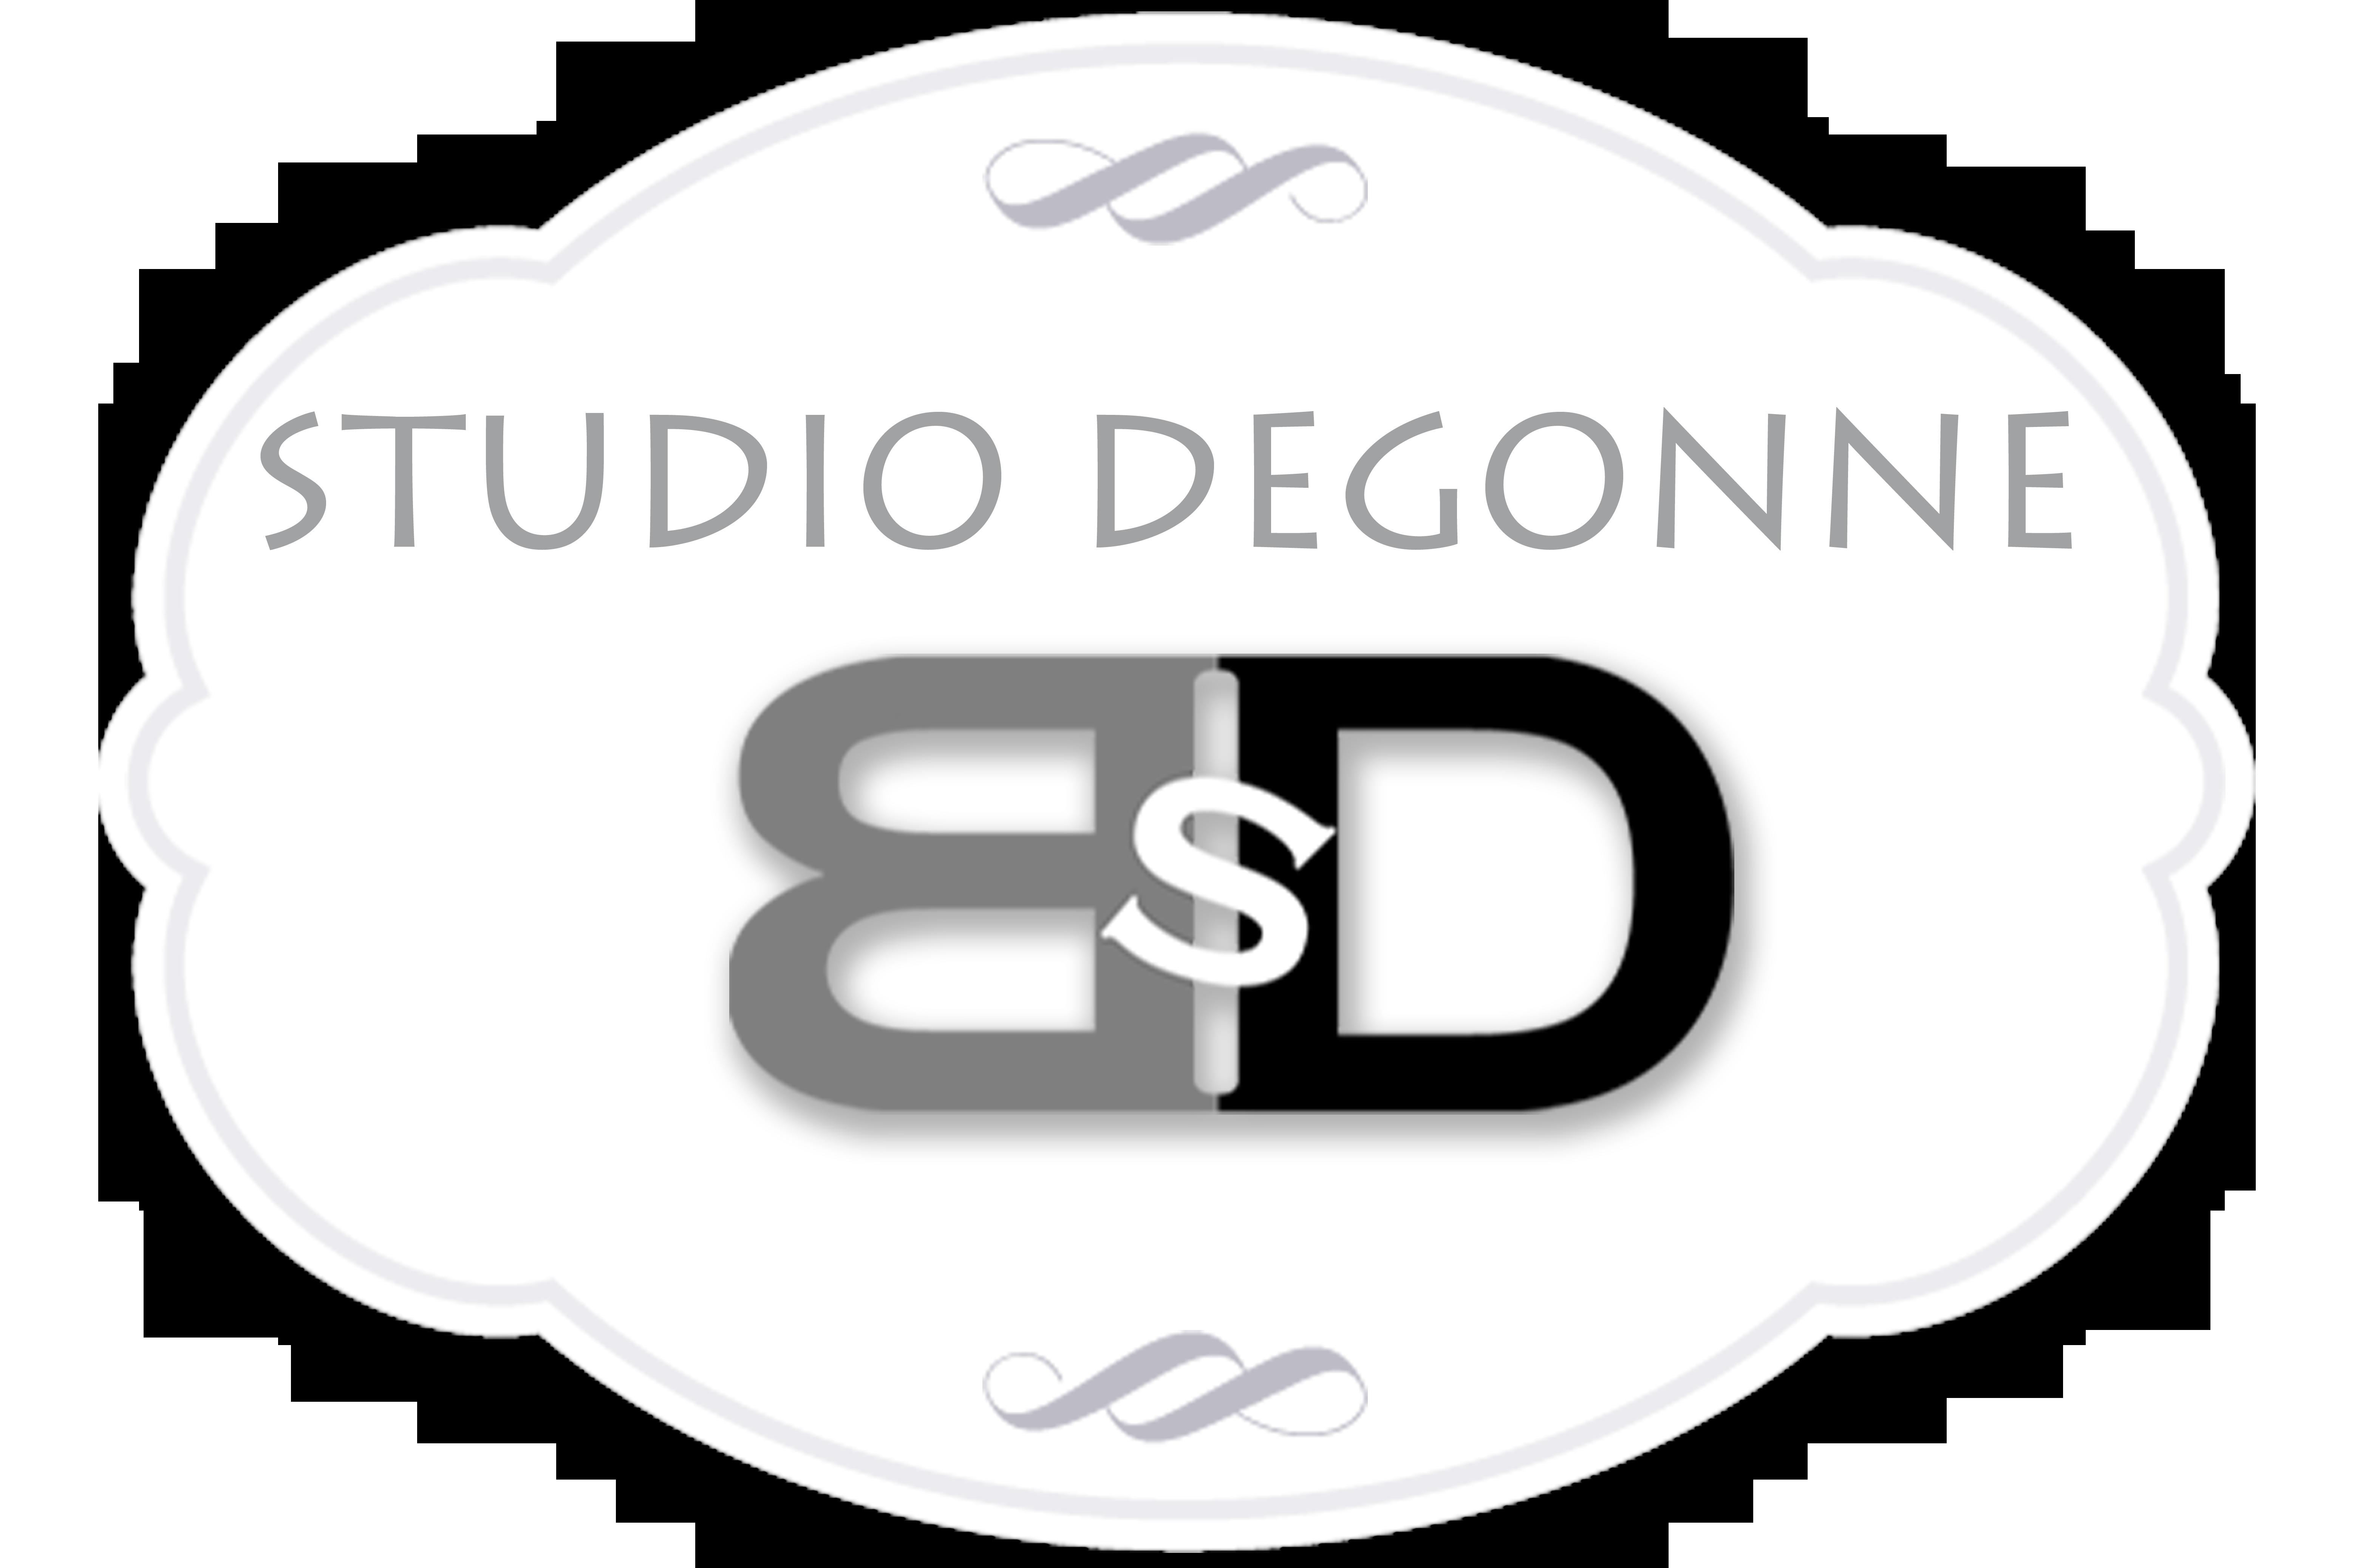 Studio DEGONNE